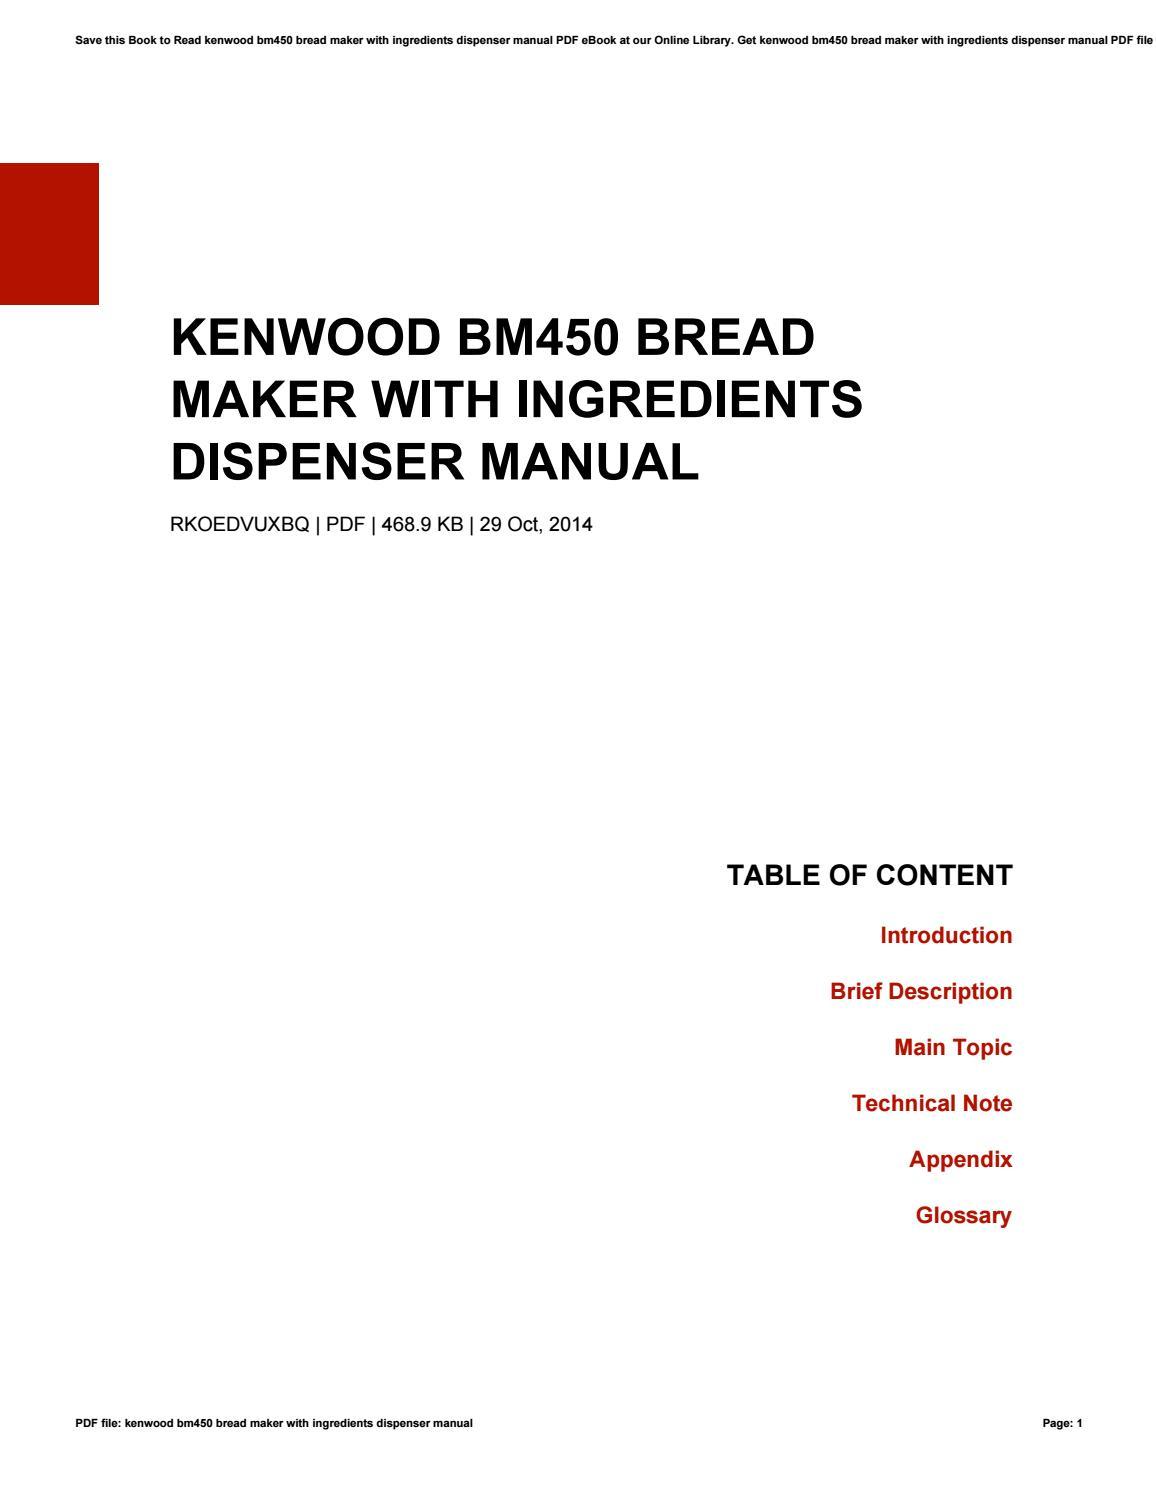 kenwood bm450 user manual